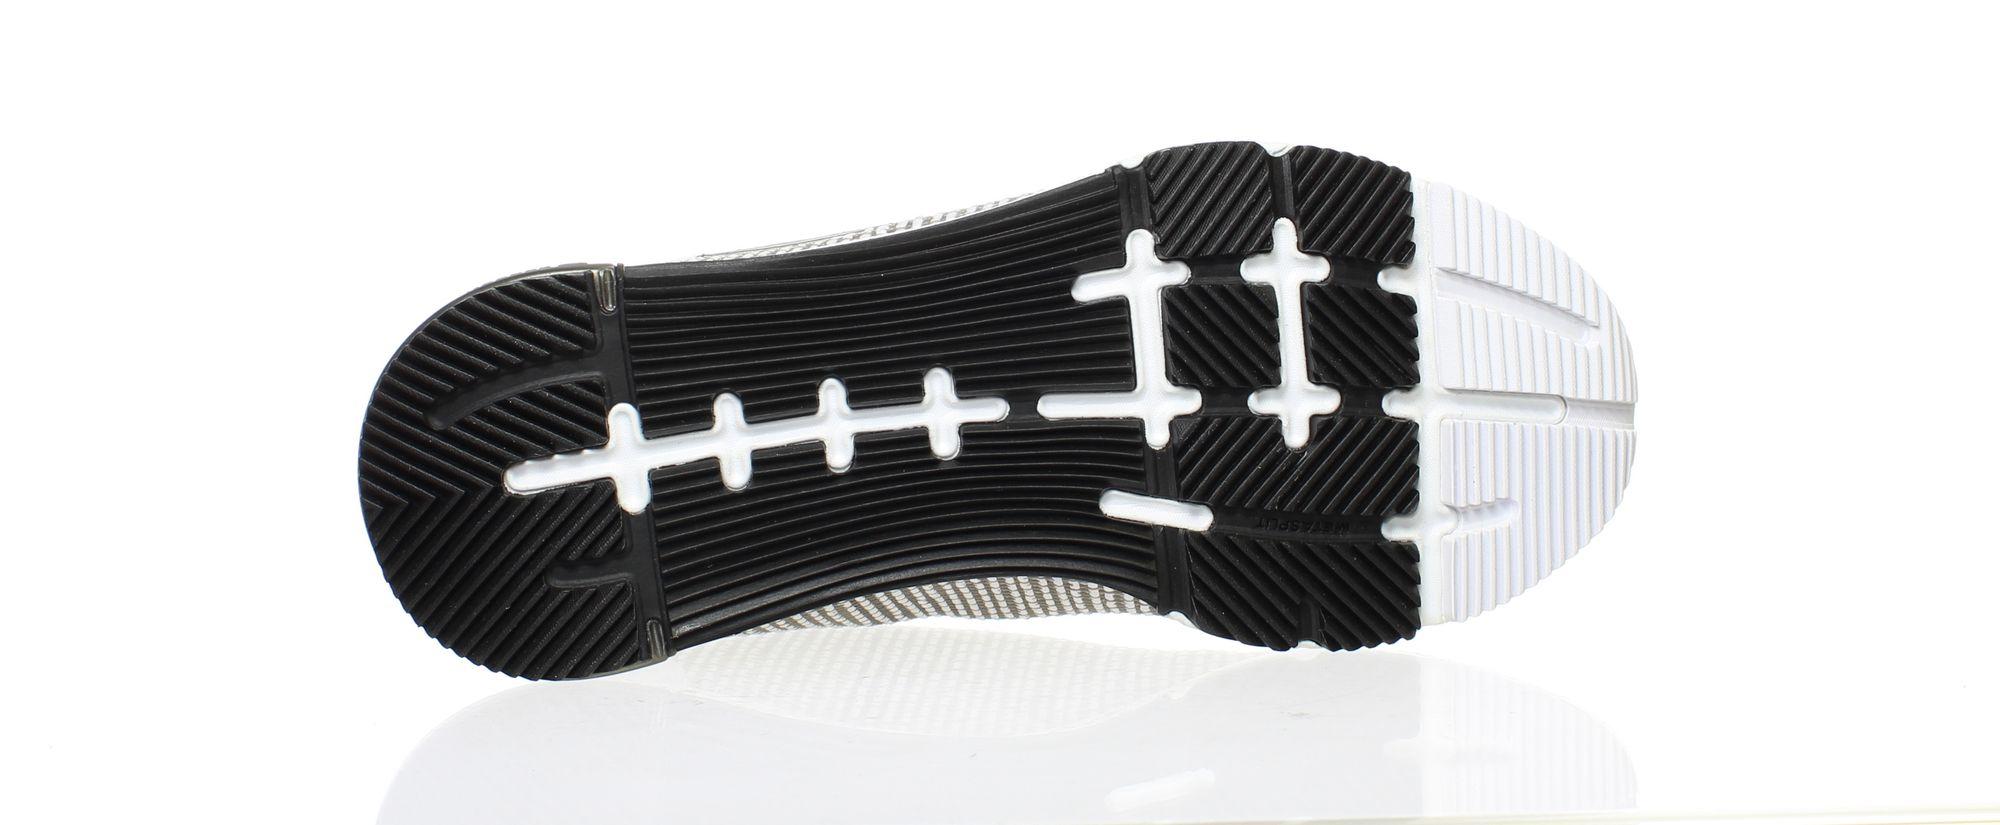 Reebok-Mens-Athletic-Speed-TR-Flexweave-Cross-Training-Shoes thumbnail 25